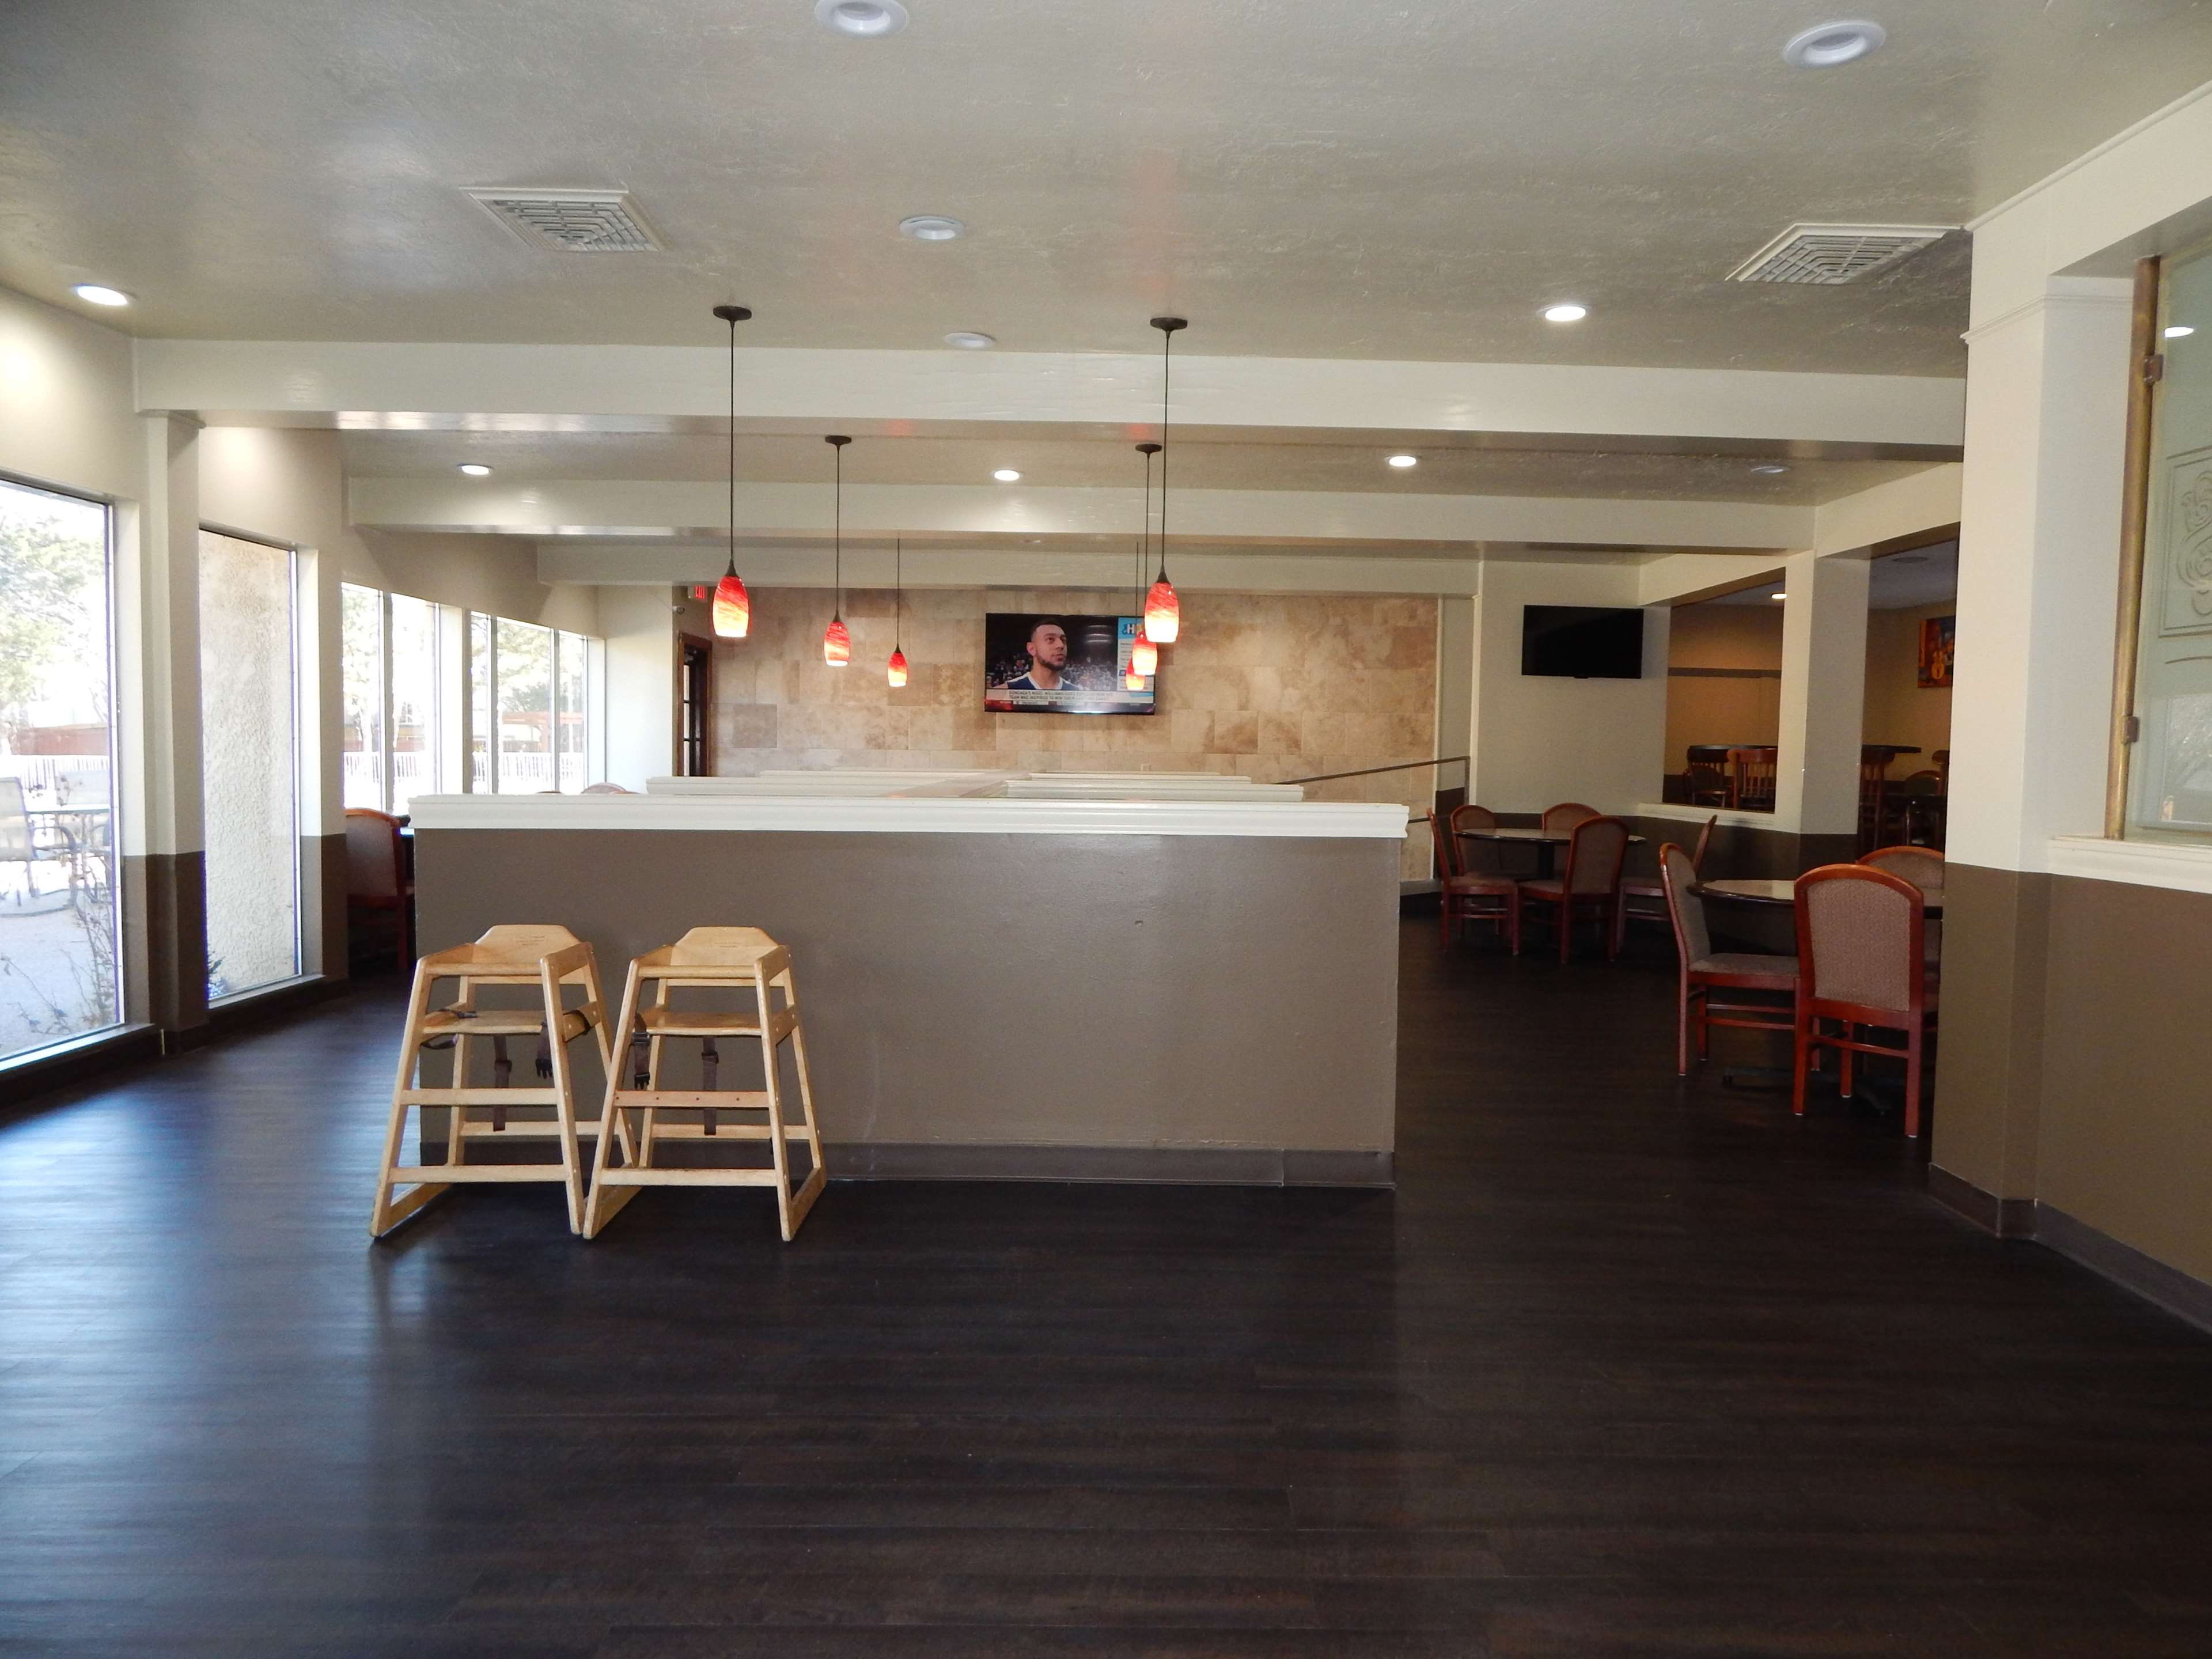 Best Western Plus Lawton Hotel & Convention Center image 45